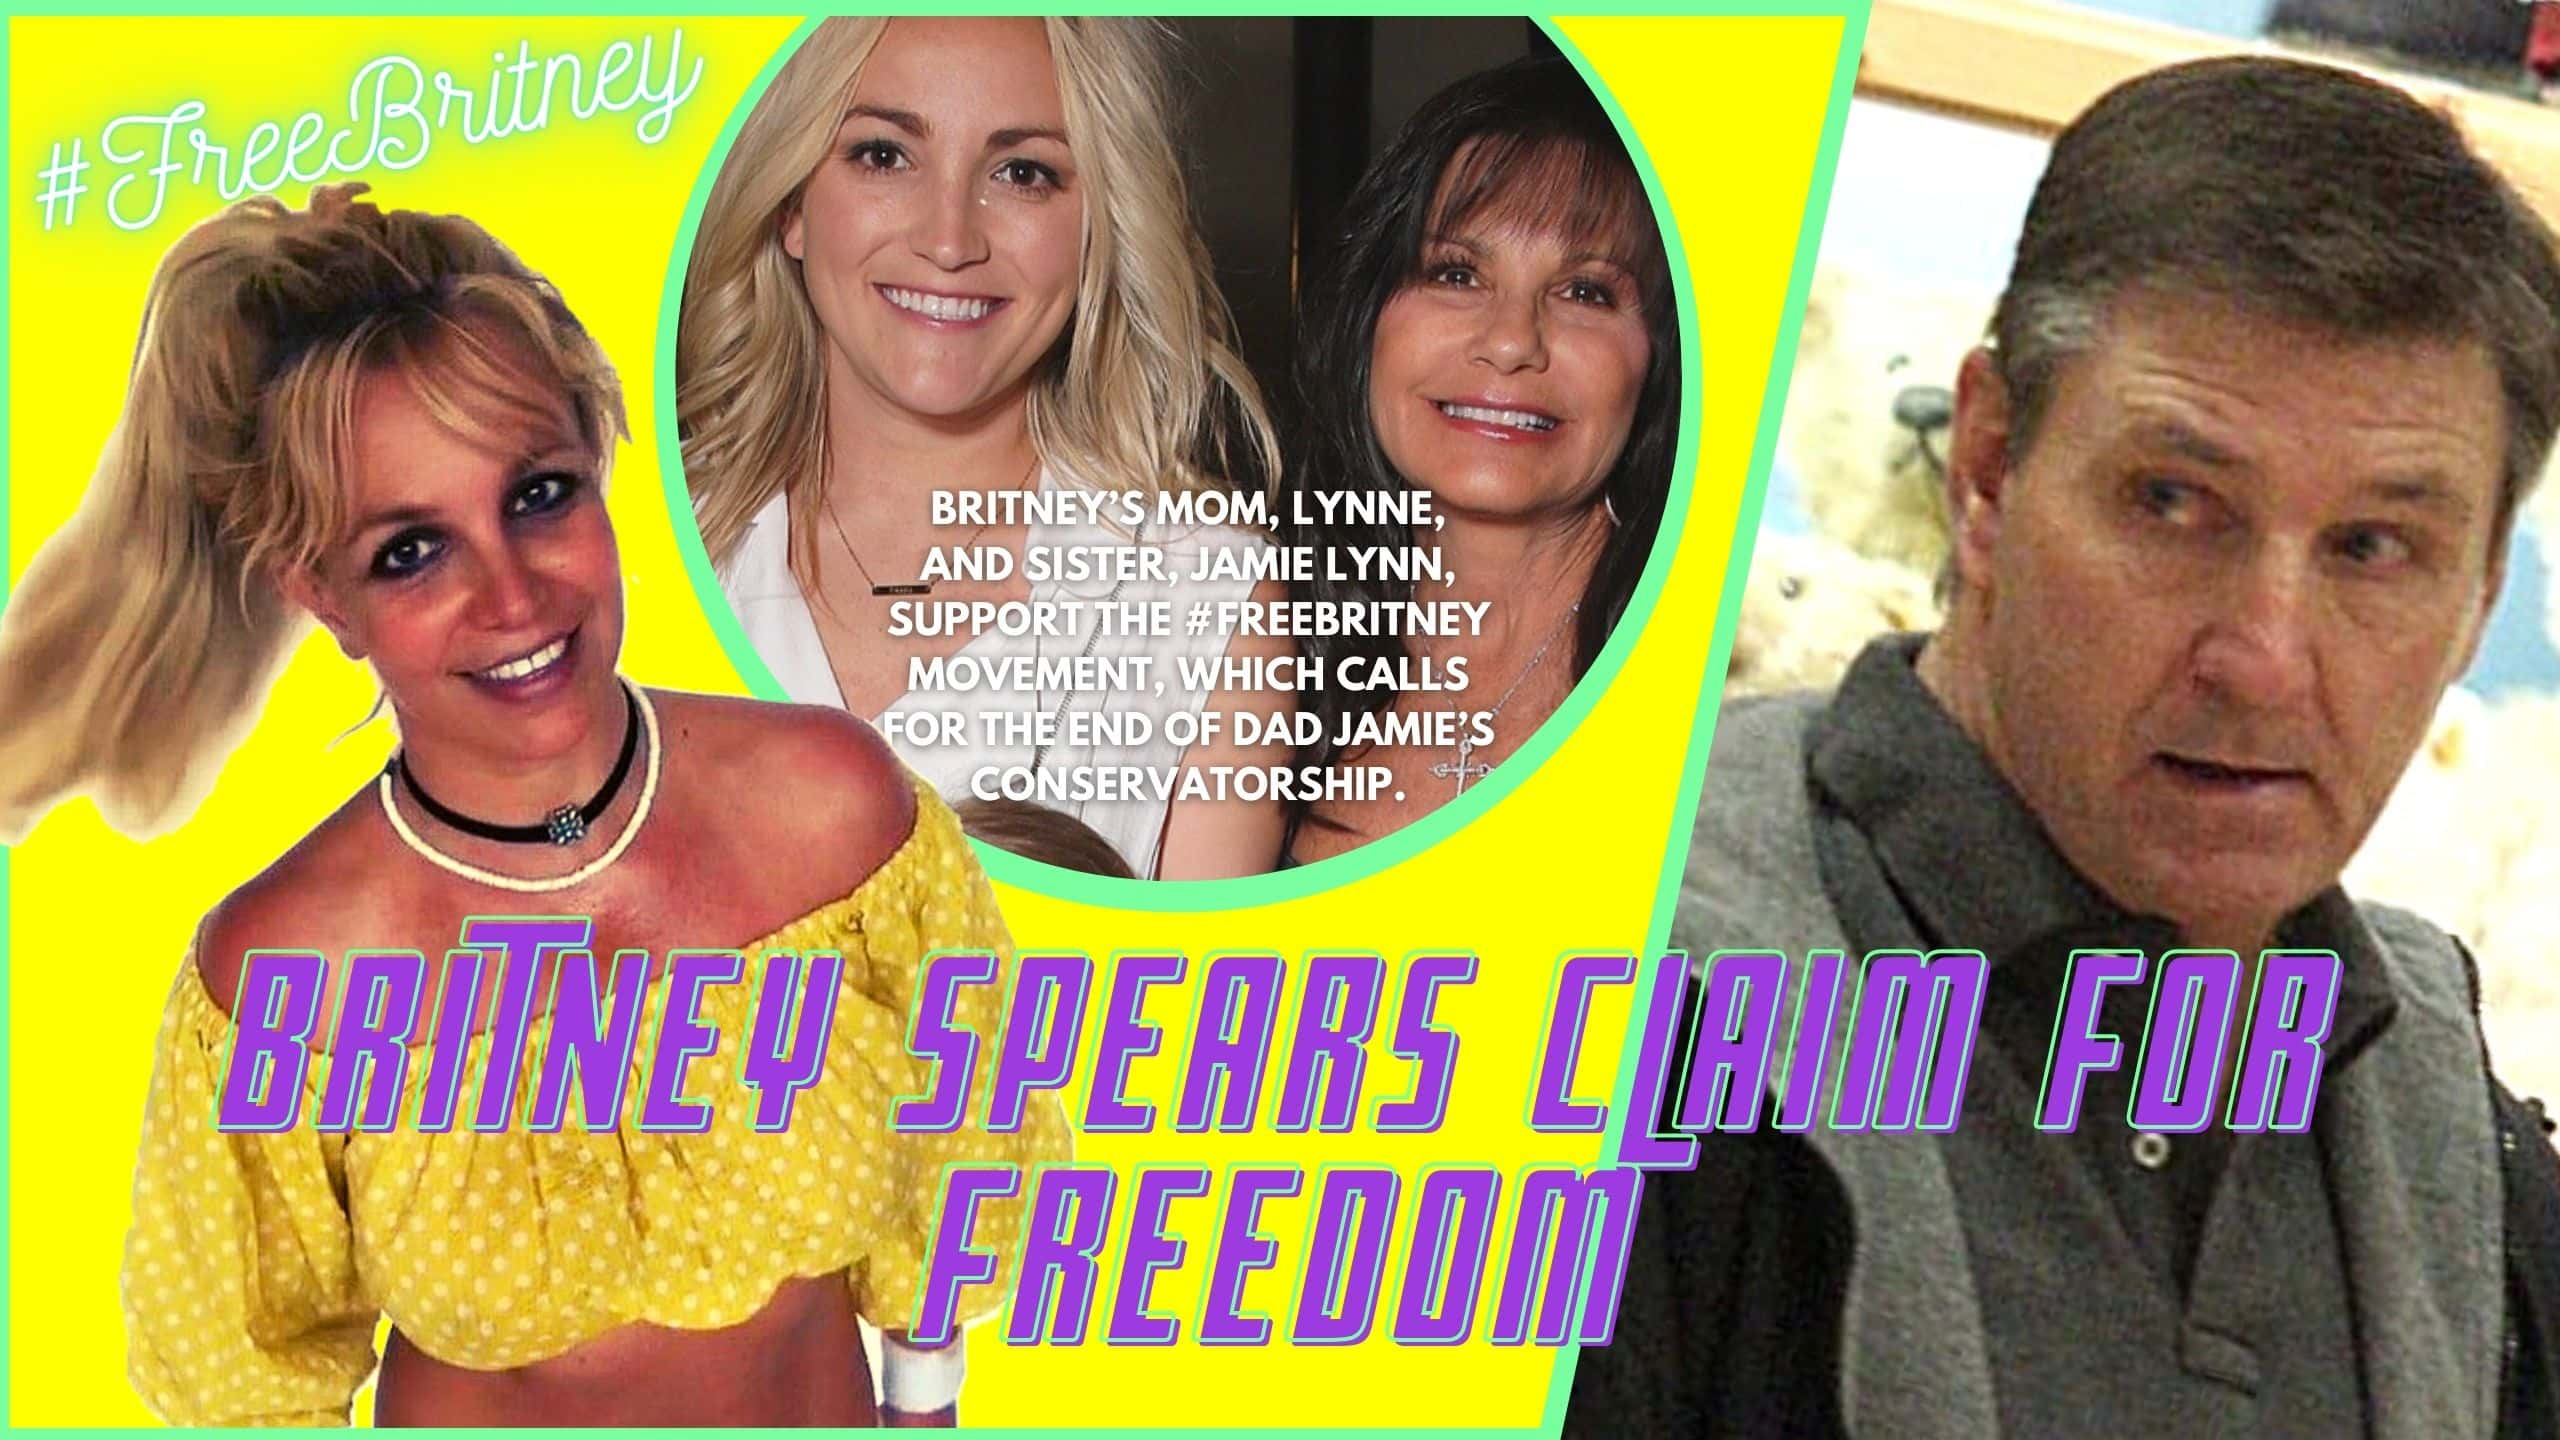 Britney Spears Claim For Freedom Freebritney